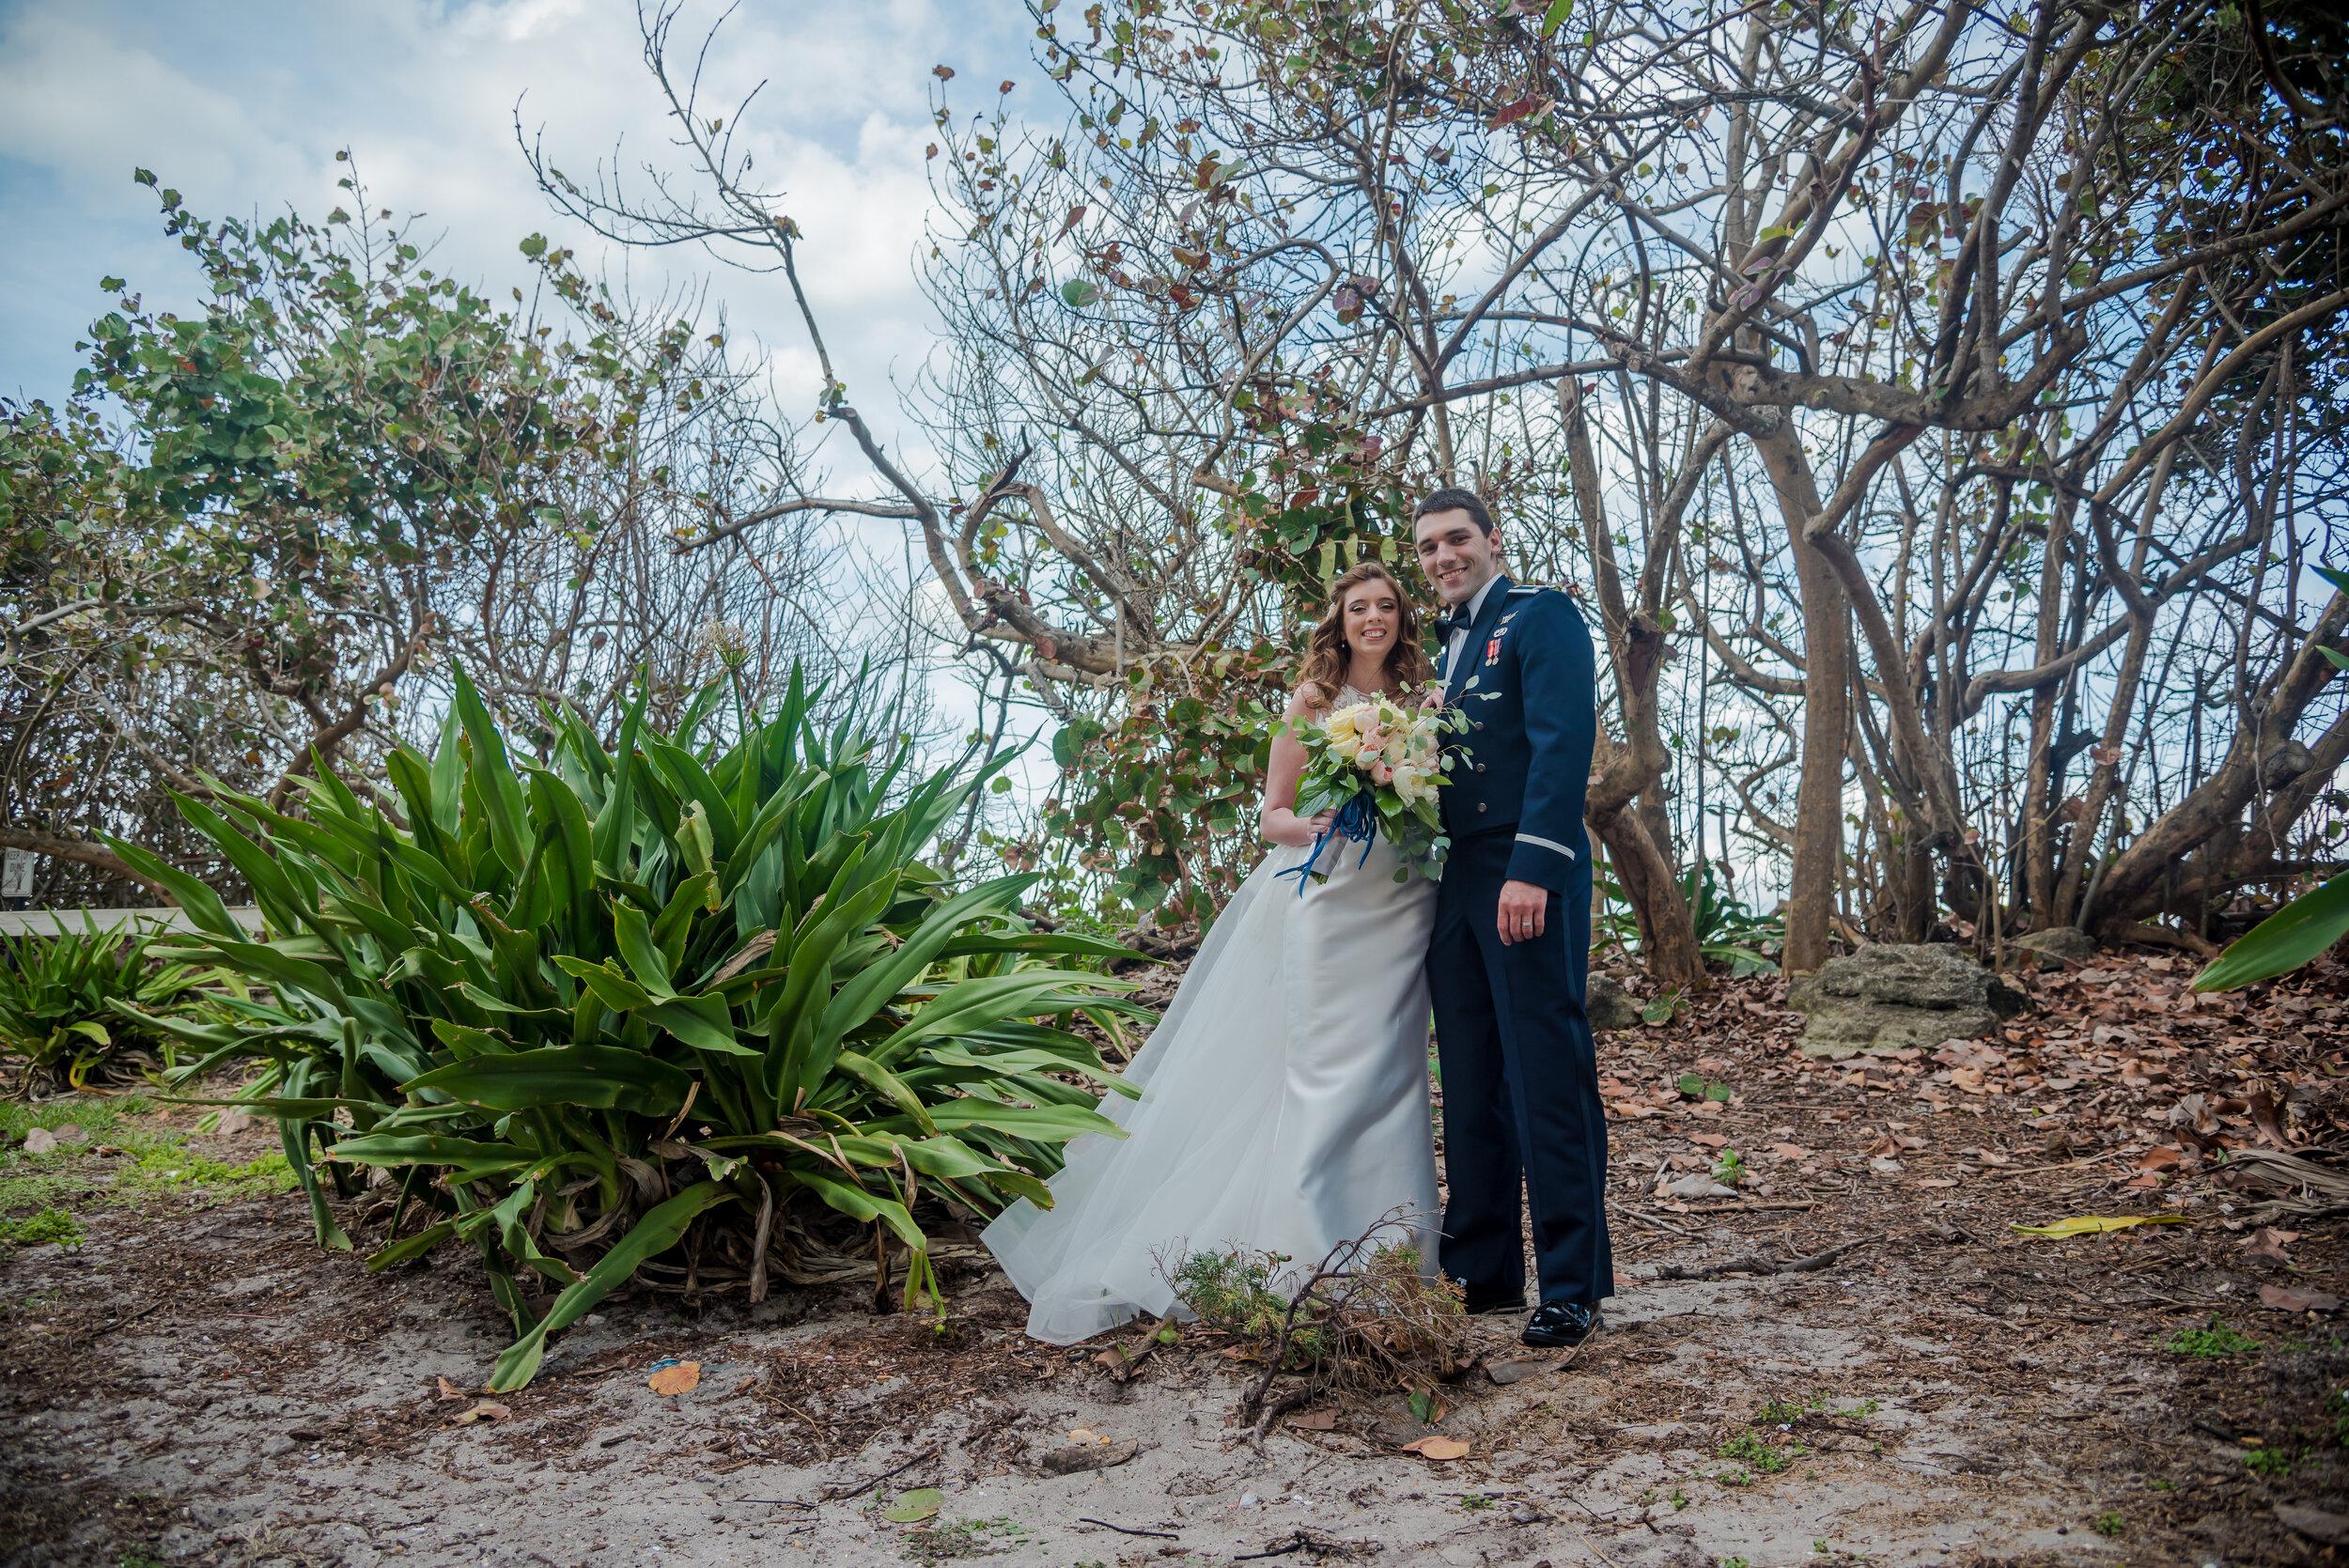 andru-the-tide-club-air-force-wedding-patrickafb-1-12.jpg